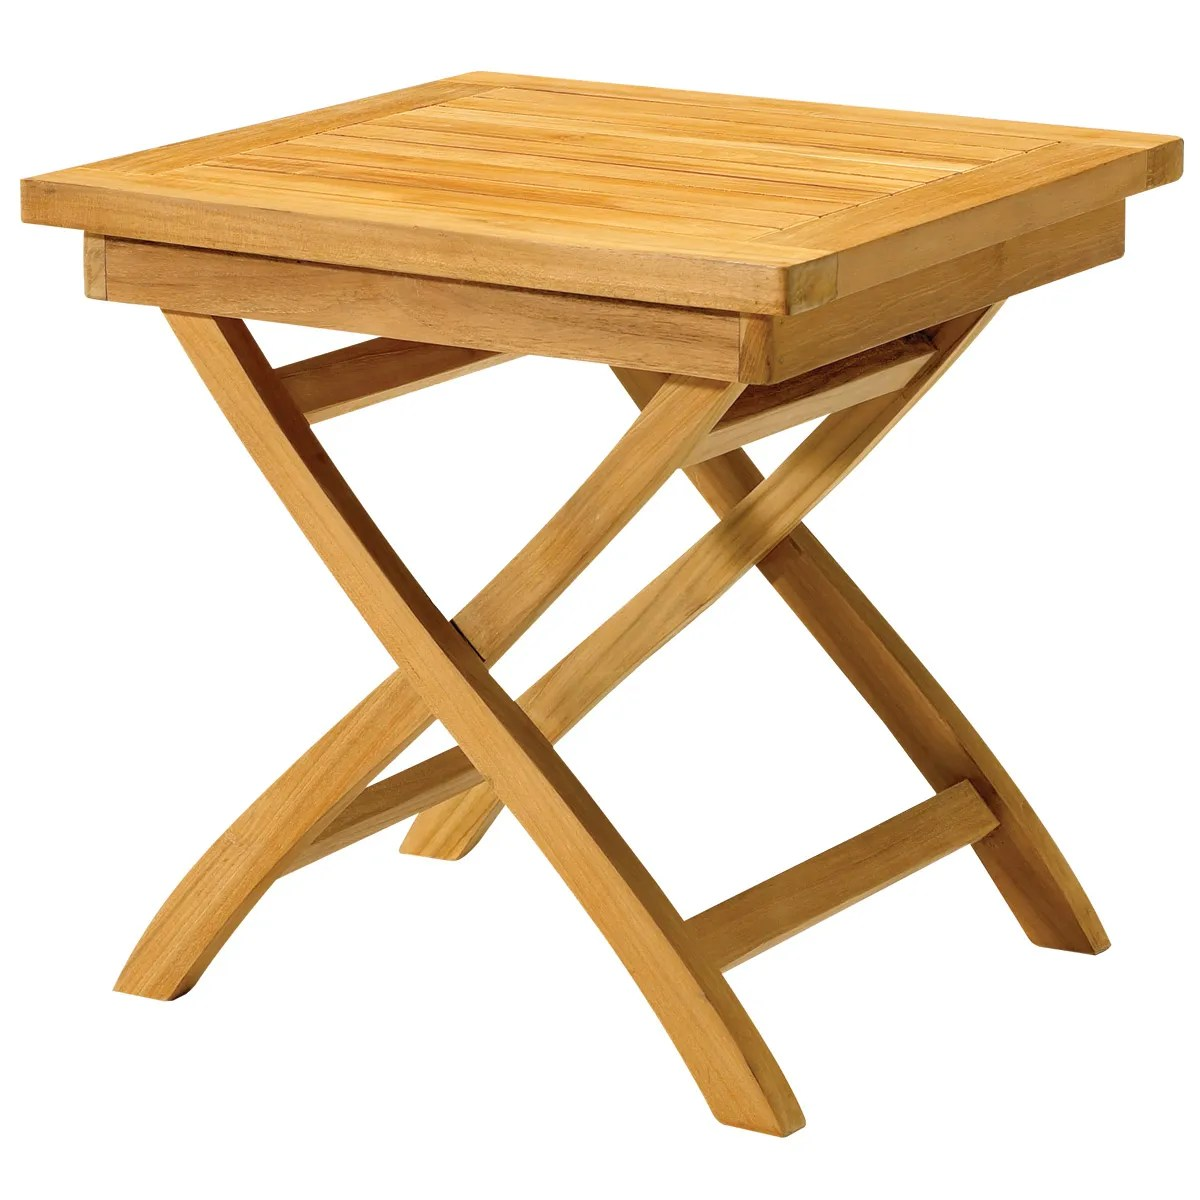 Outdoor Teak Folding Side Table From Sportys Preferred